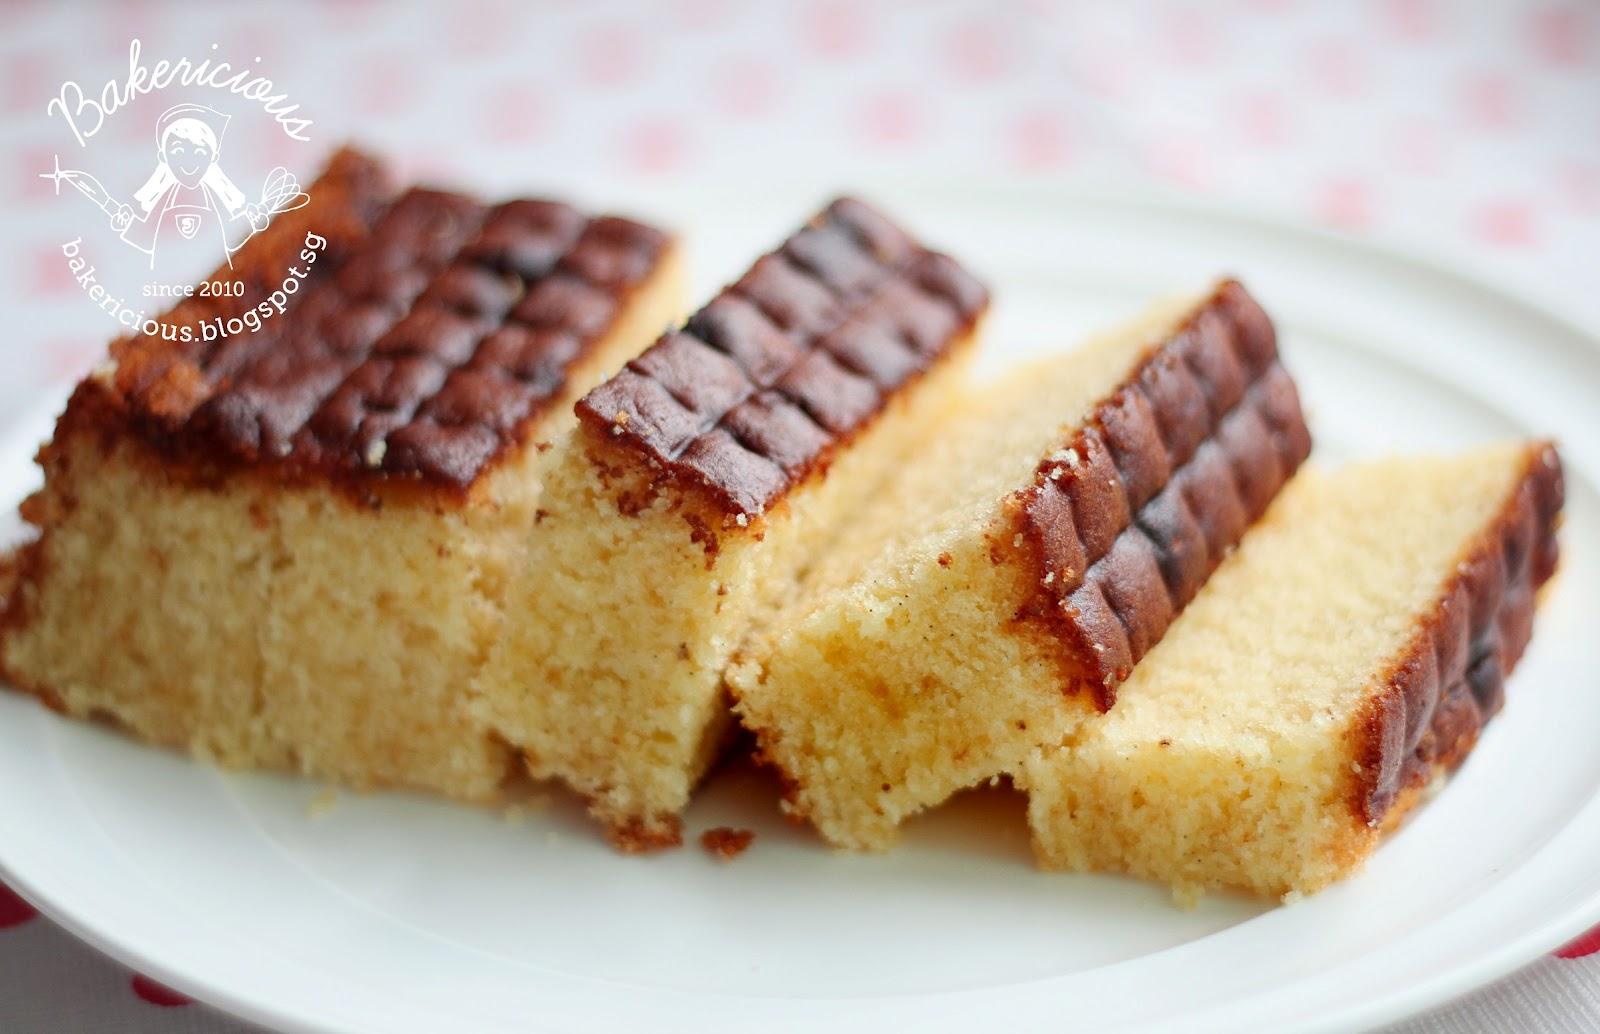 Bakericious: Mrs NgSK Vanilla Butter Cake